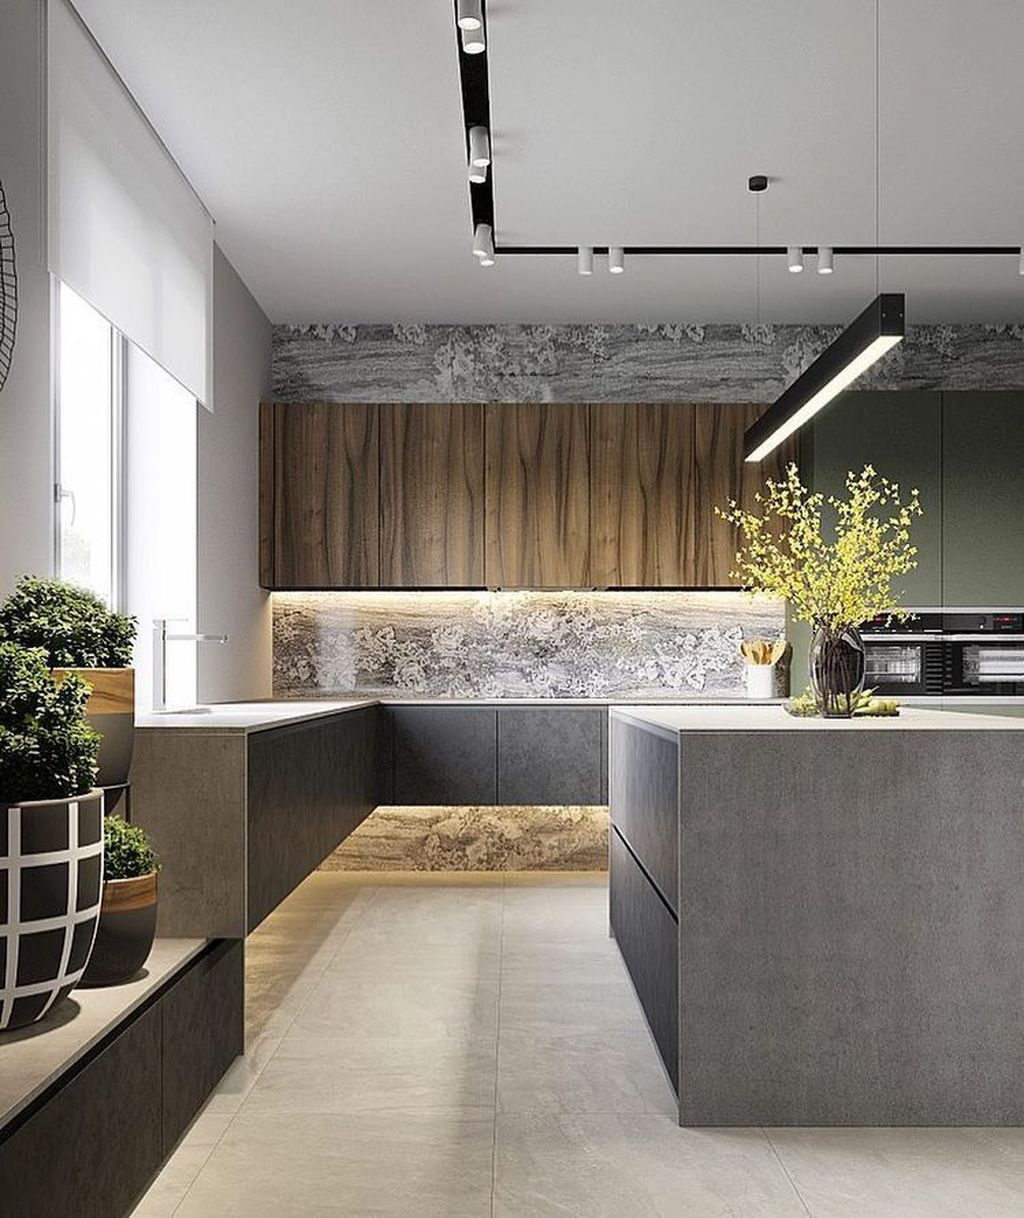 Popular Minimalist Kitchen Design Ideas You Never Seen Before 26